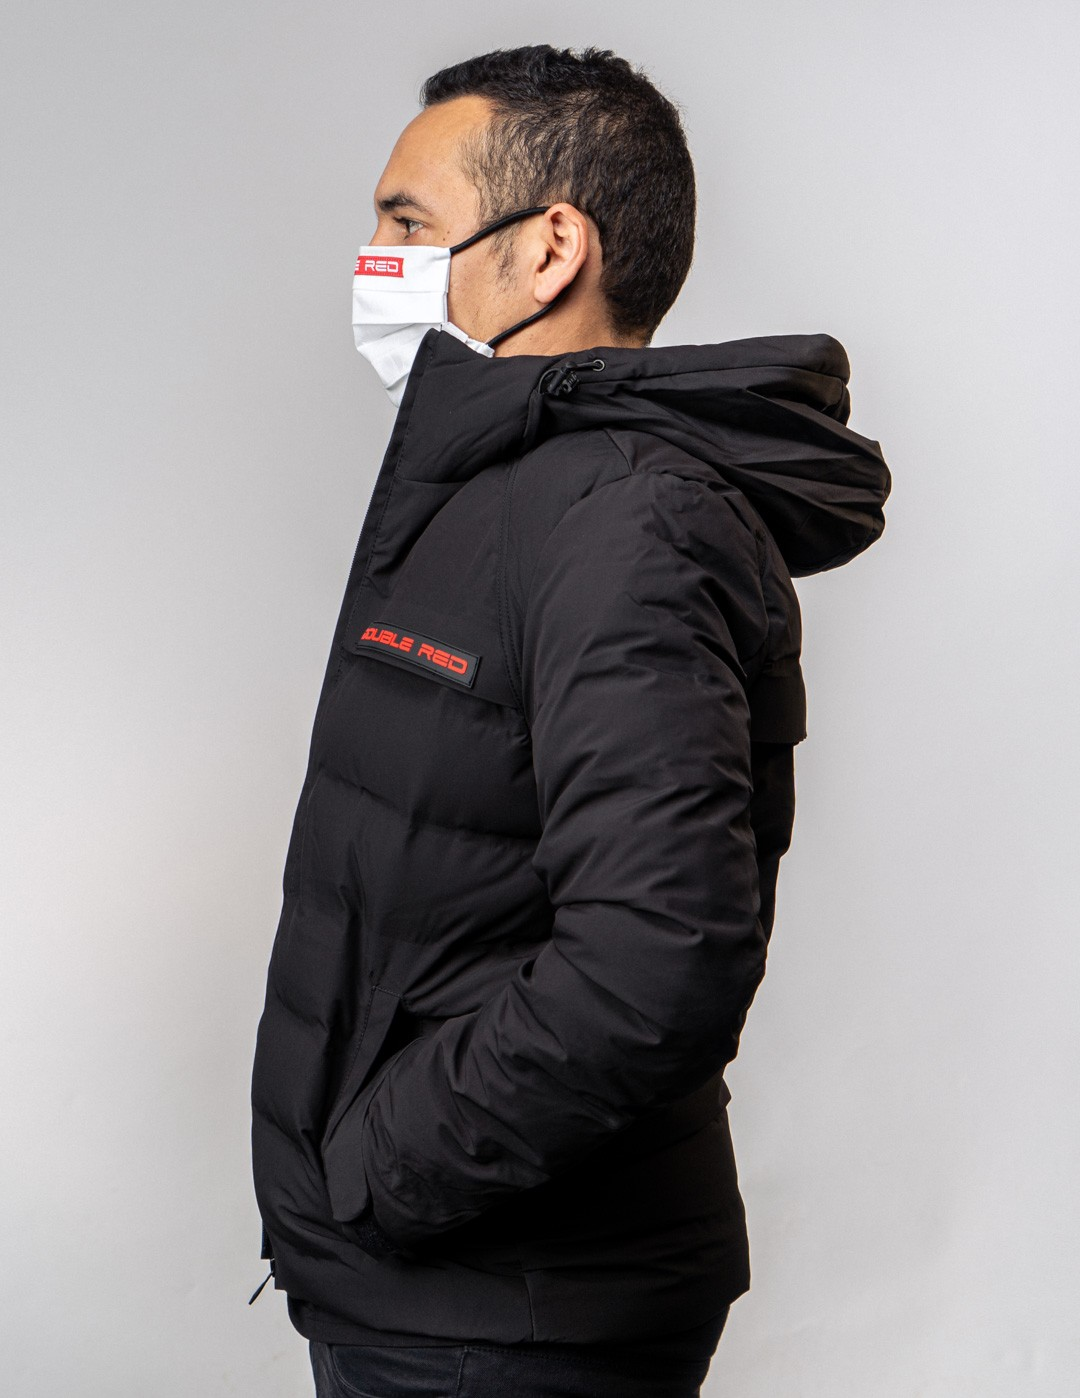 WHISTLER Jacket Black